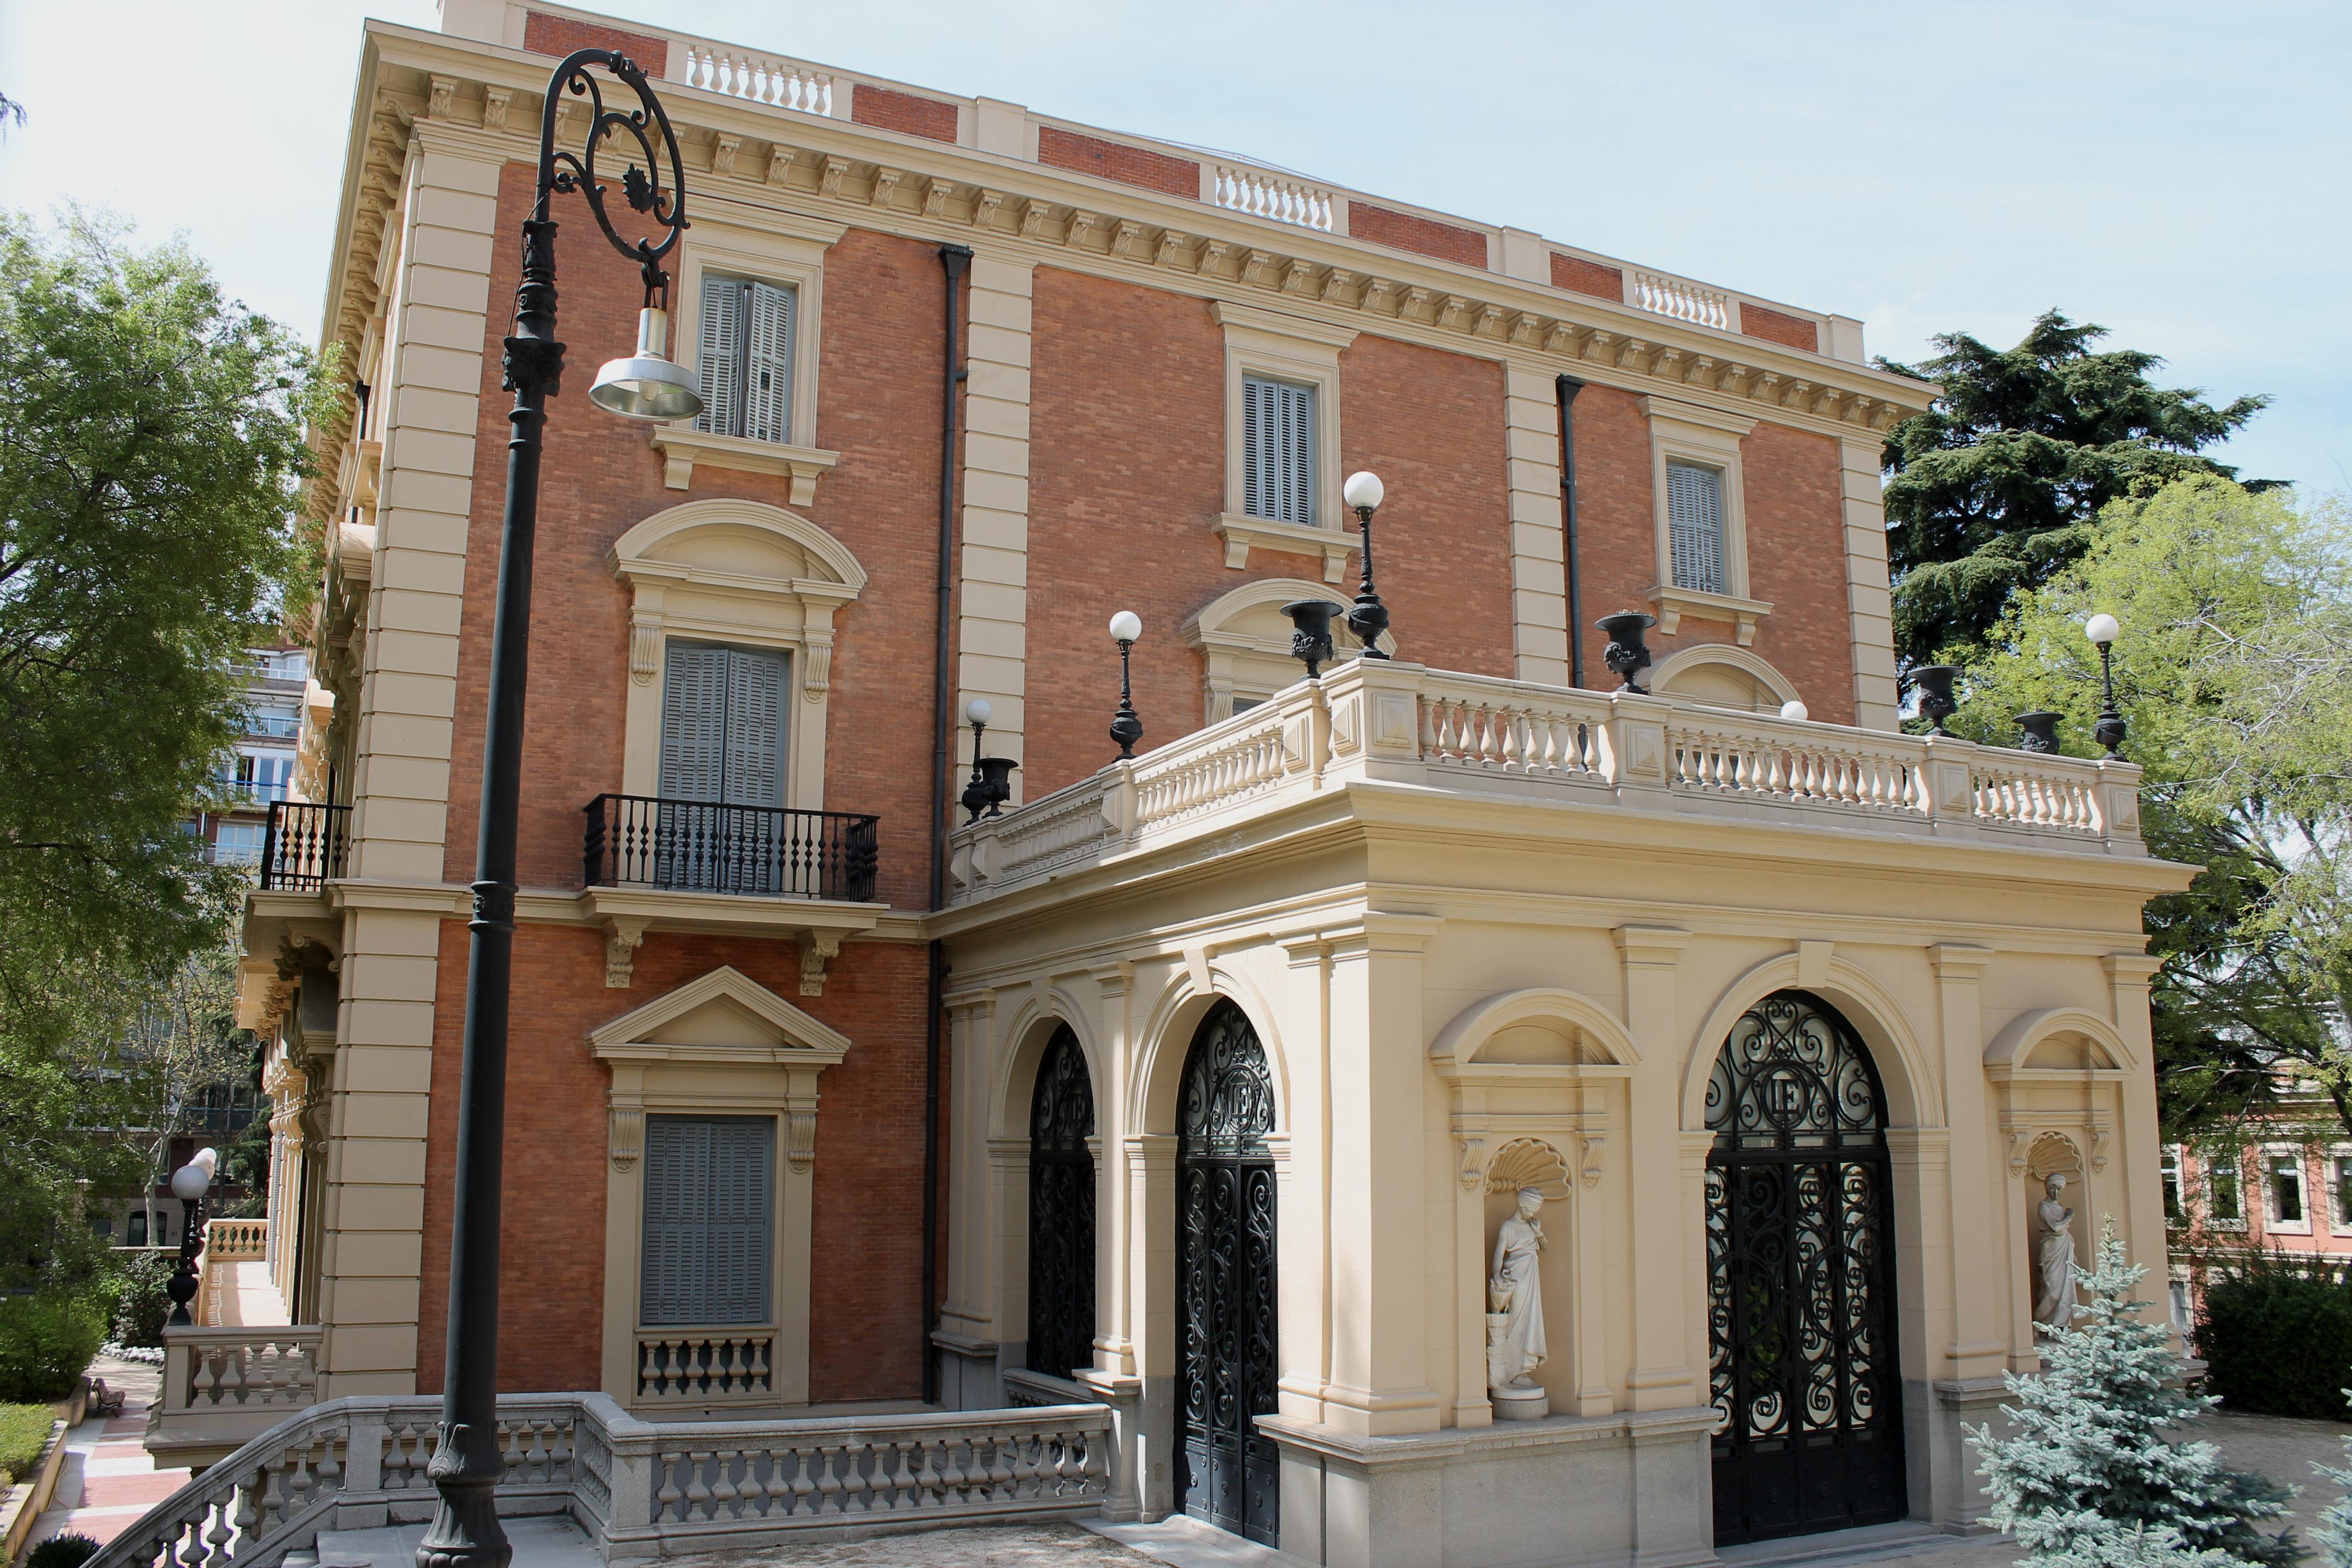 Madrid Salamanca Travel Guide At Wikivoyage